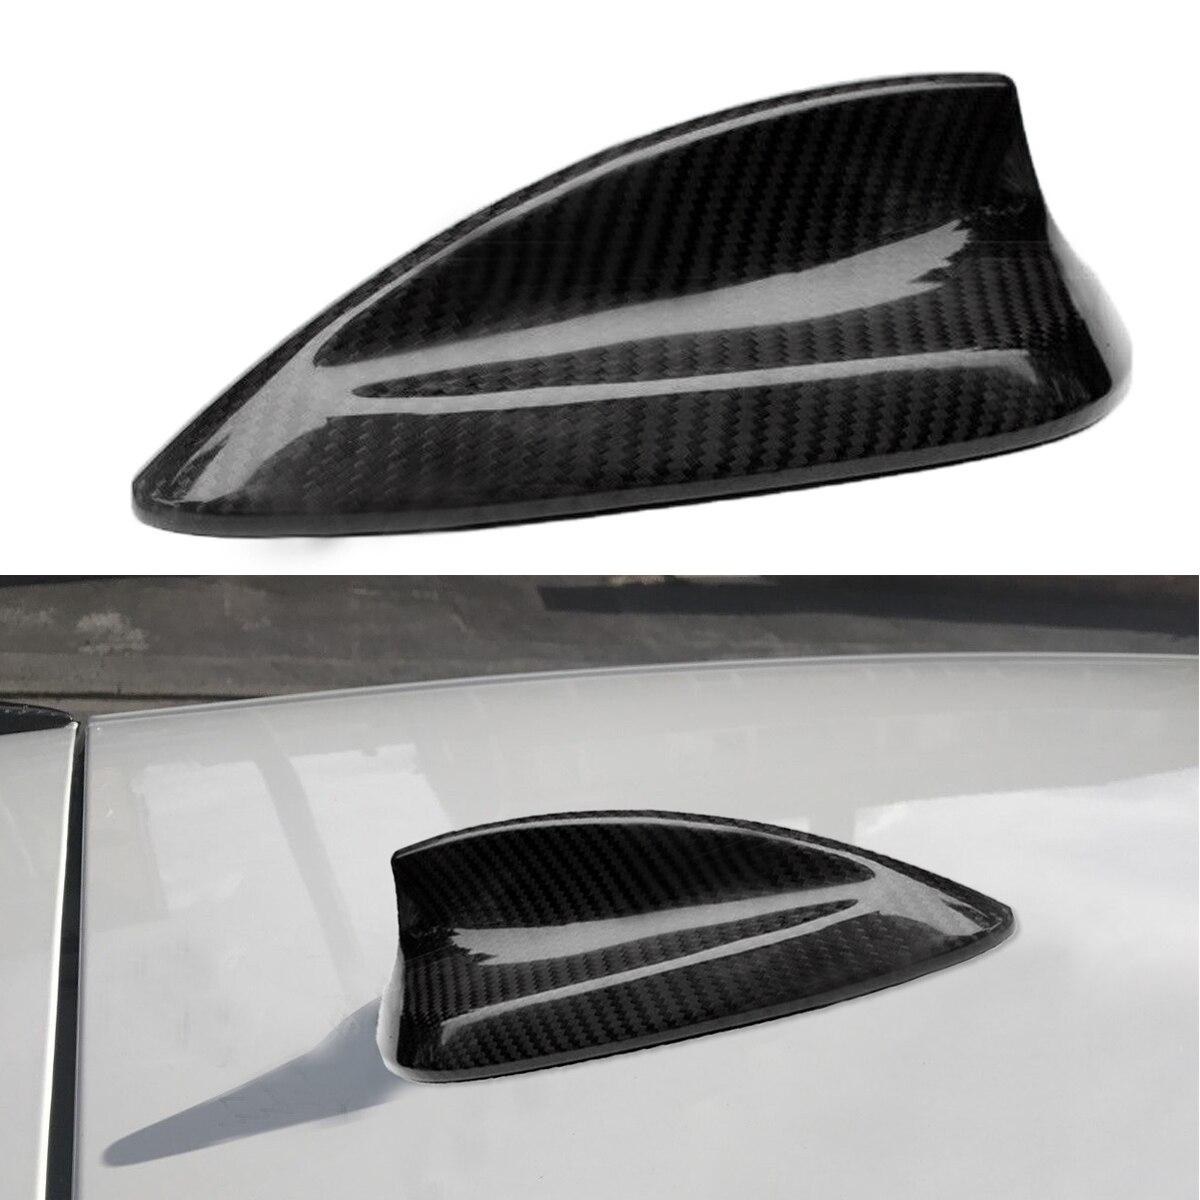 Для BMW 1 2 3 4 серии F20 F22 F23 F30 F31 F32 F34 F35 F80 Универсальная автомобильная настоящая карбоновая крыша плавник акулы антенна наклейка